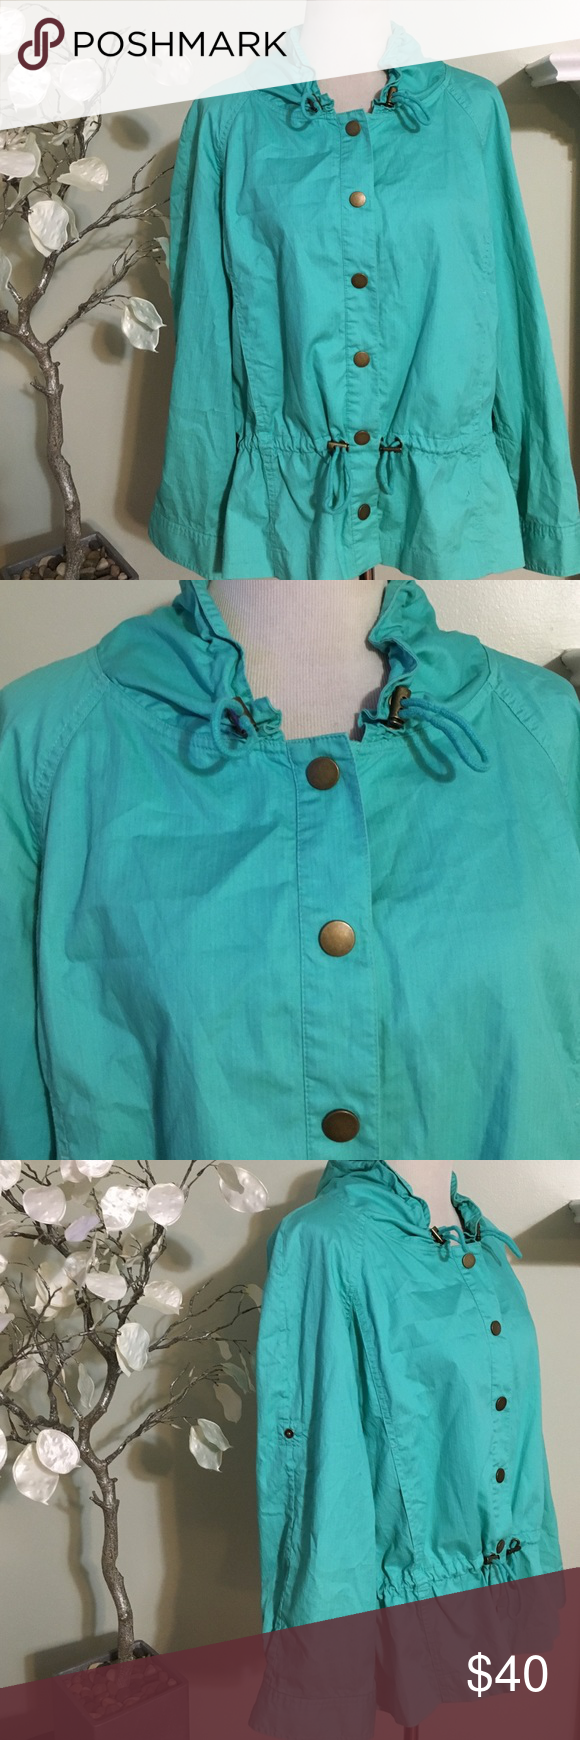 JONES NEW YORK JACKET Gorgeous light jacket in excellent condition, 100% cotton Jones New York Jackets & Coats